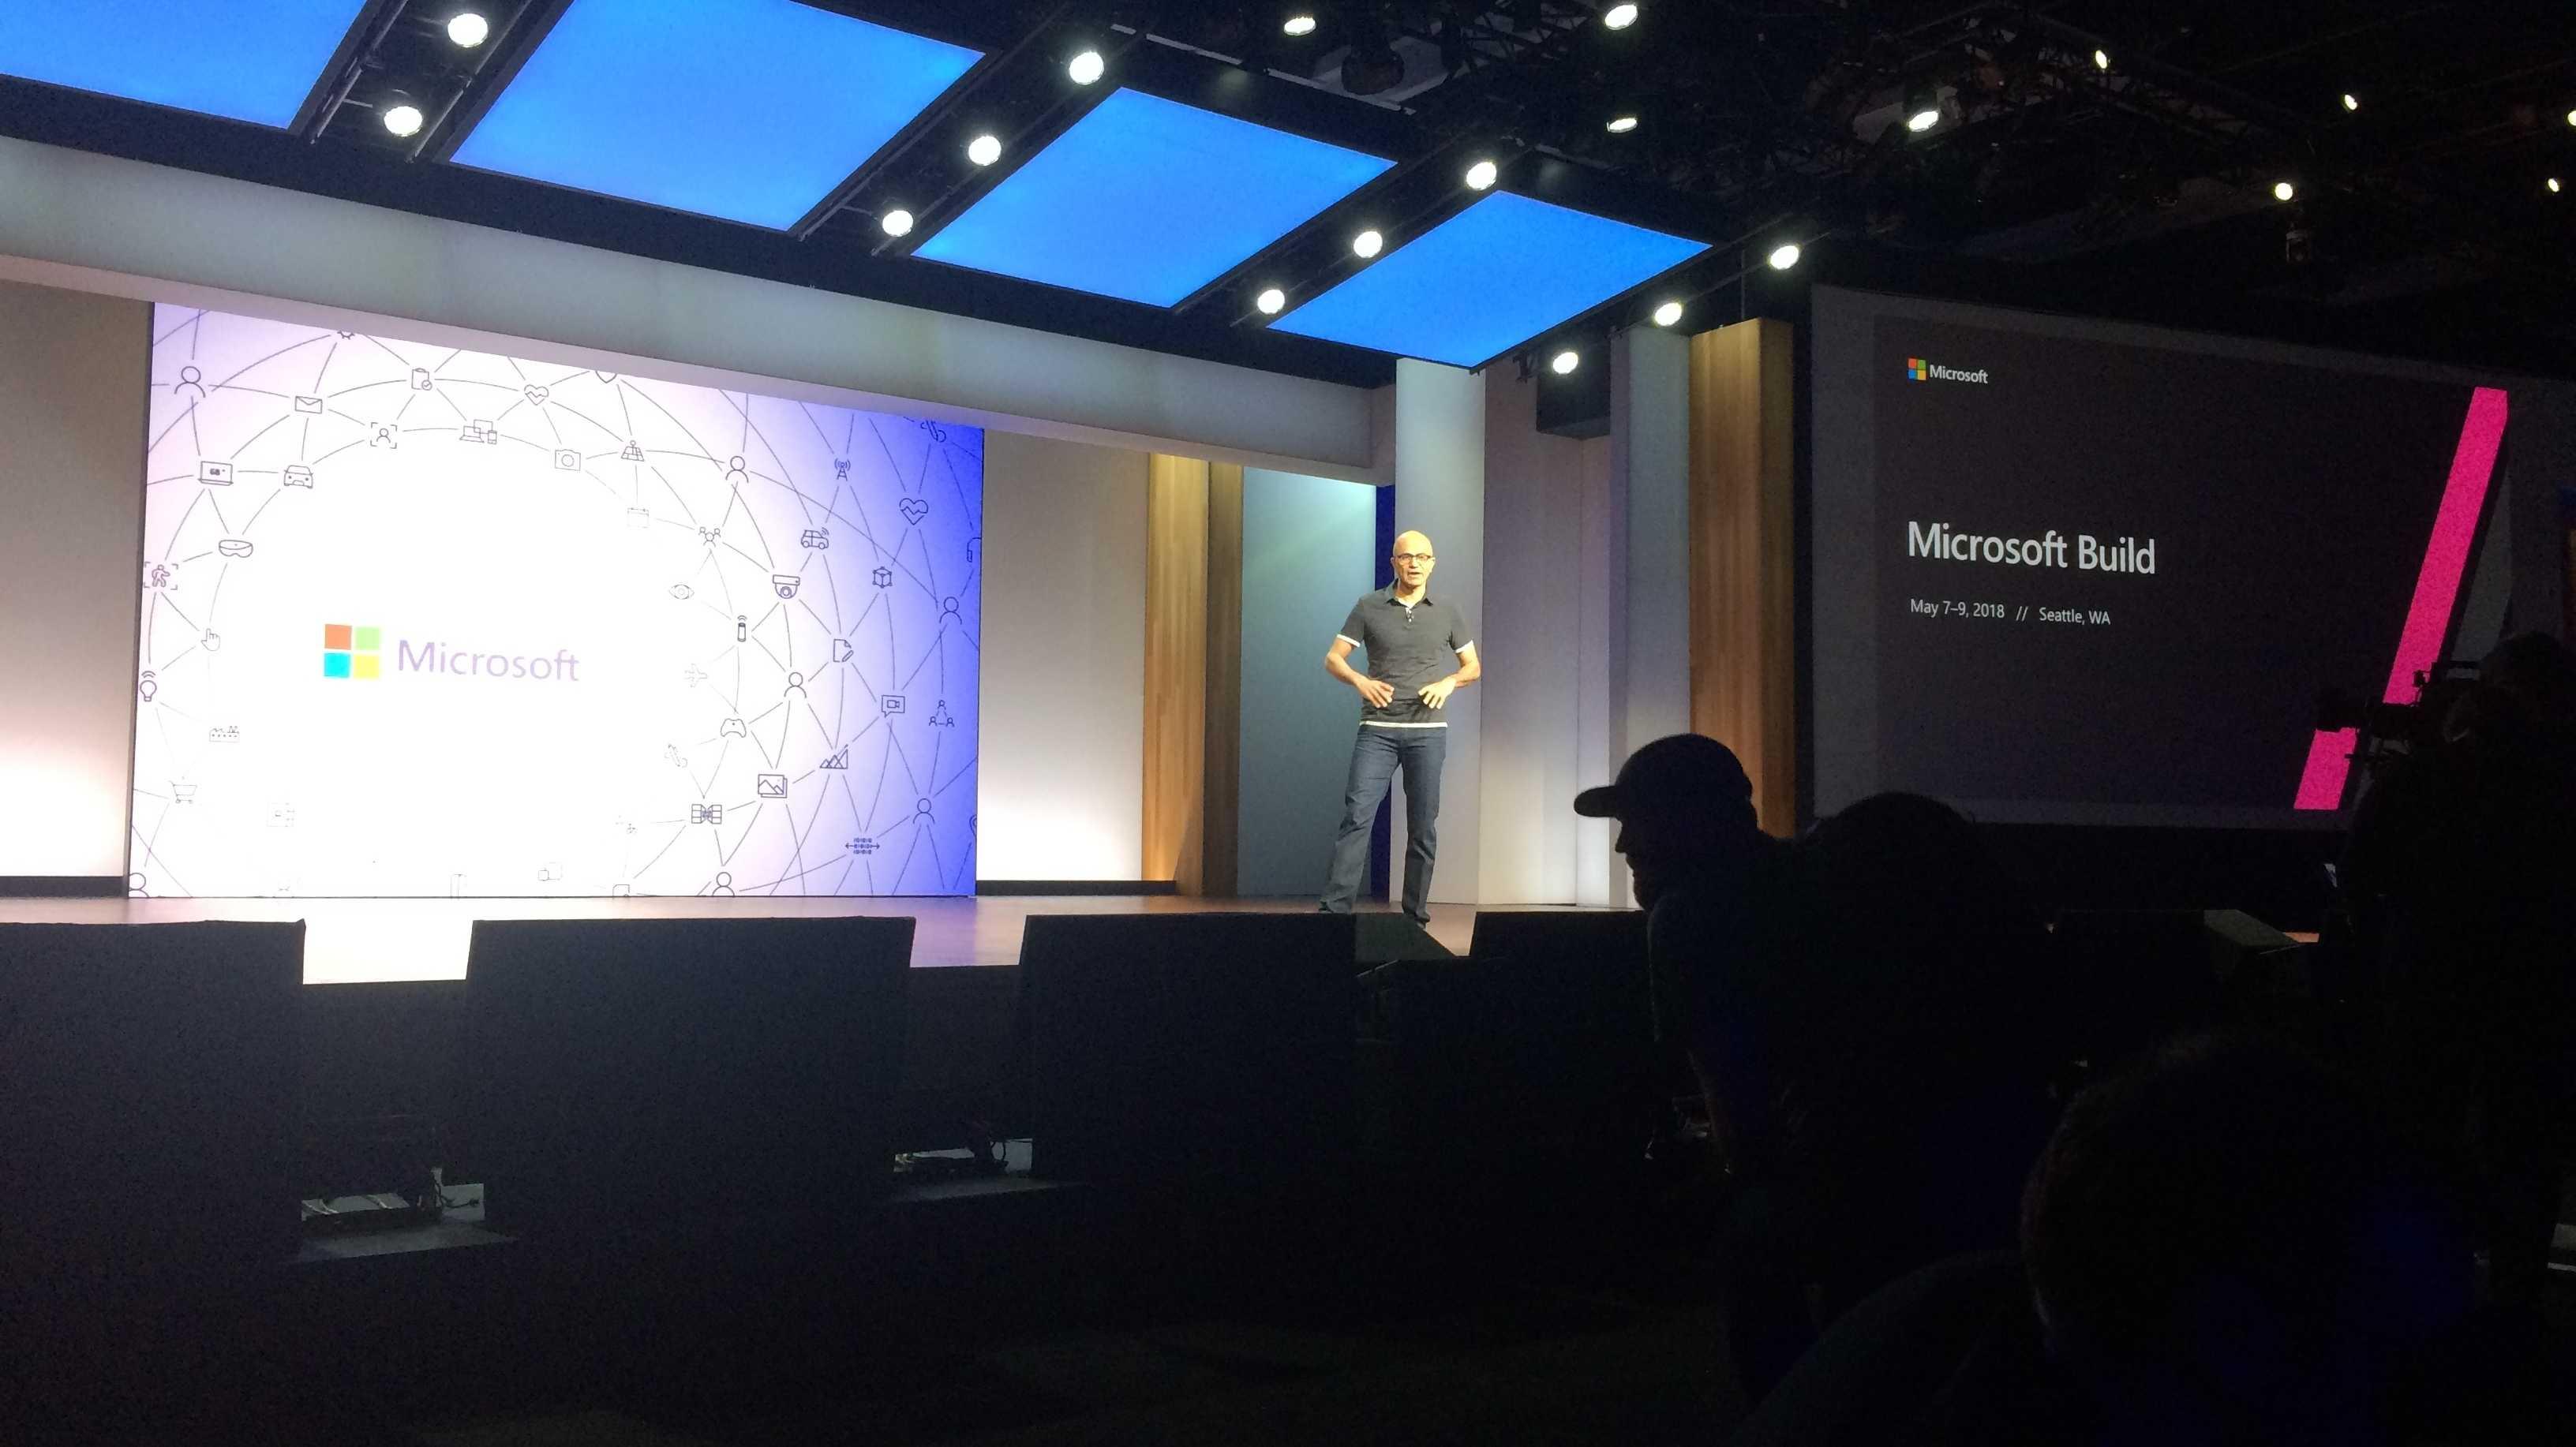 Microsoft Build eröffnet: Entwickeln mit KI